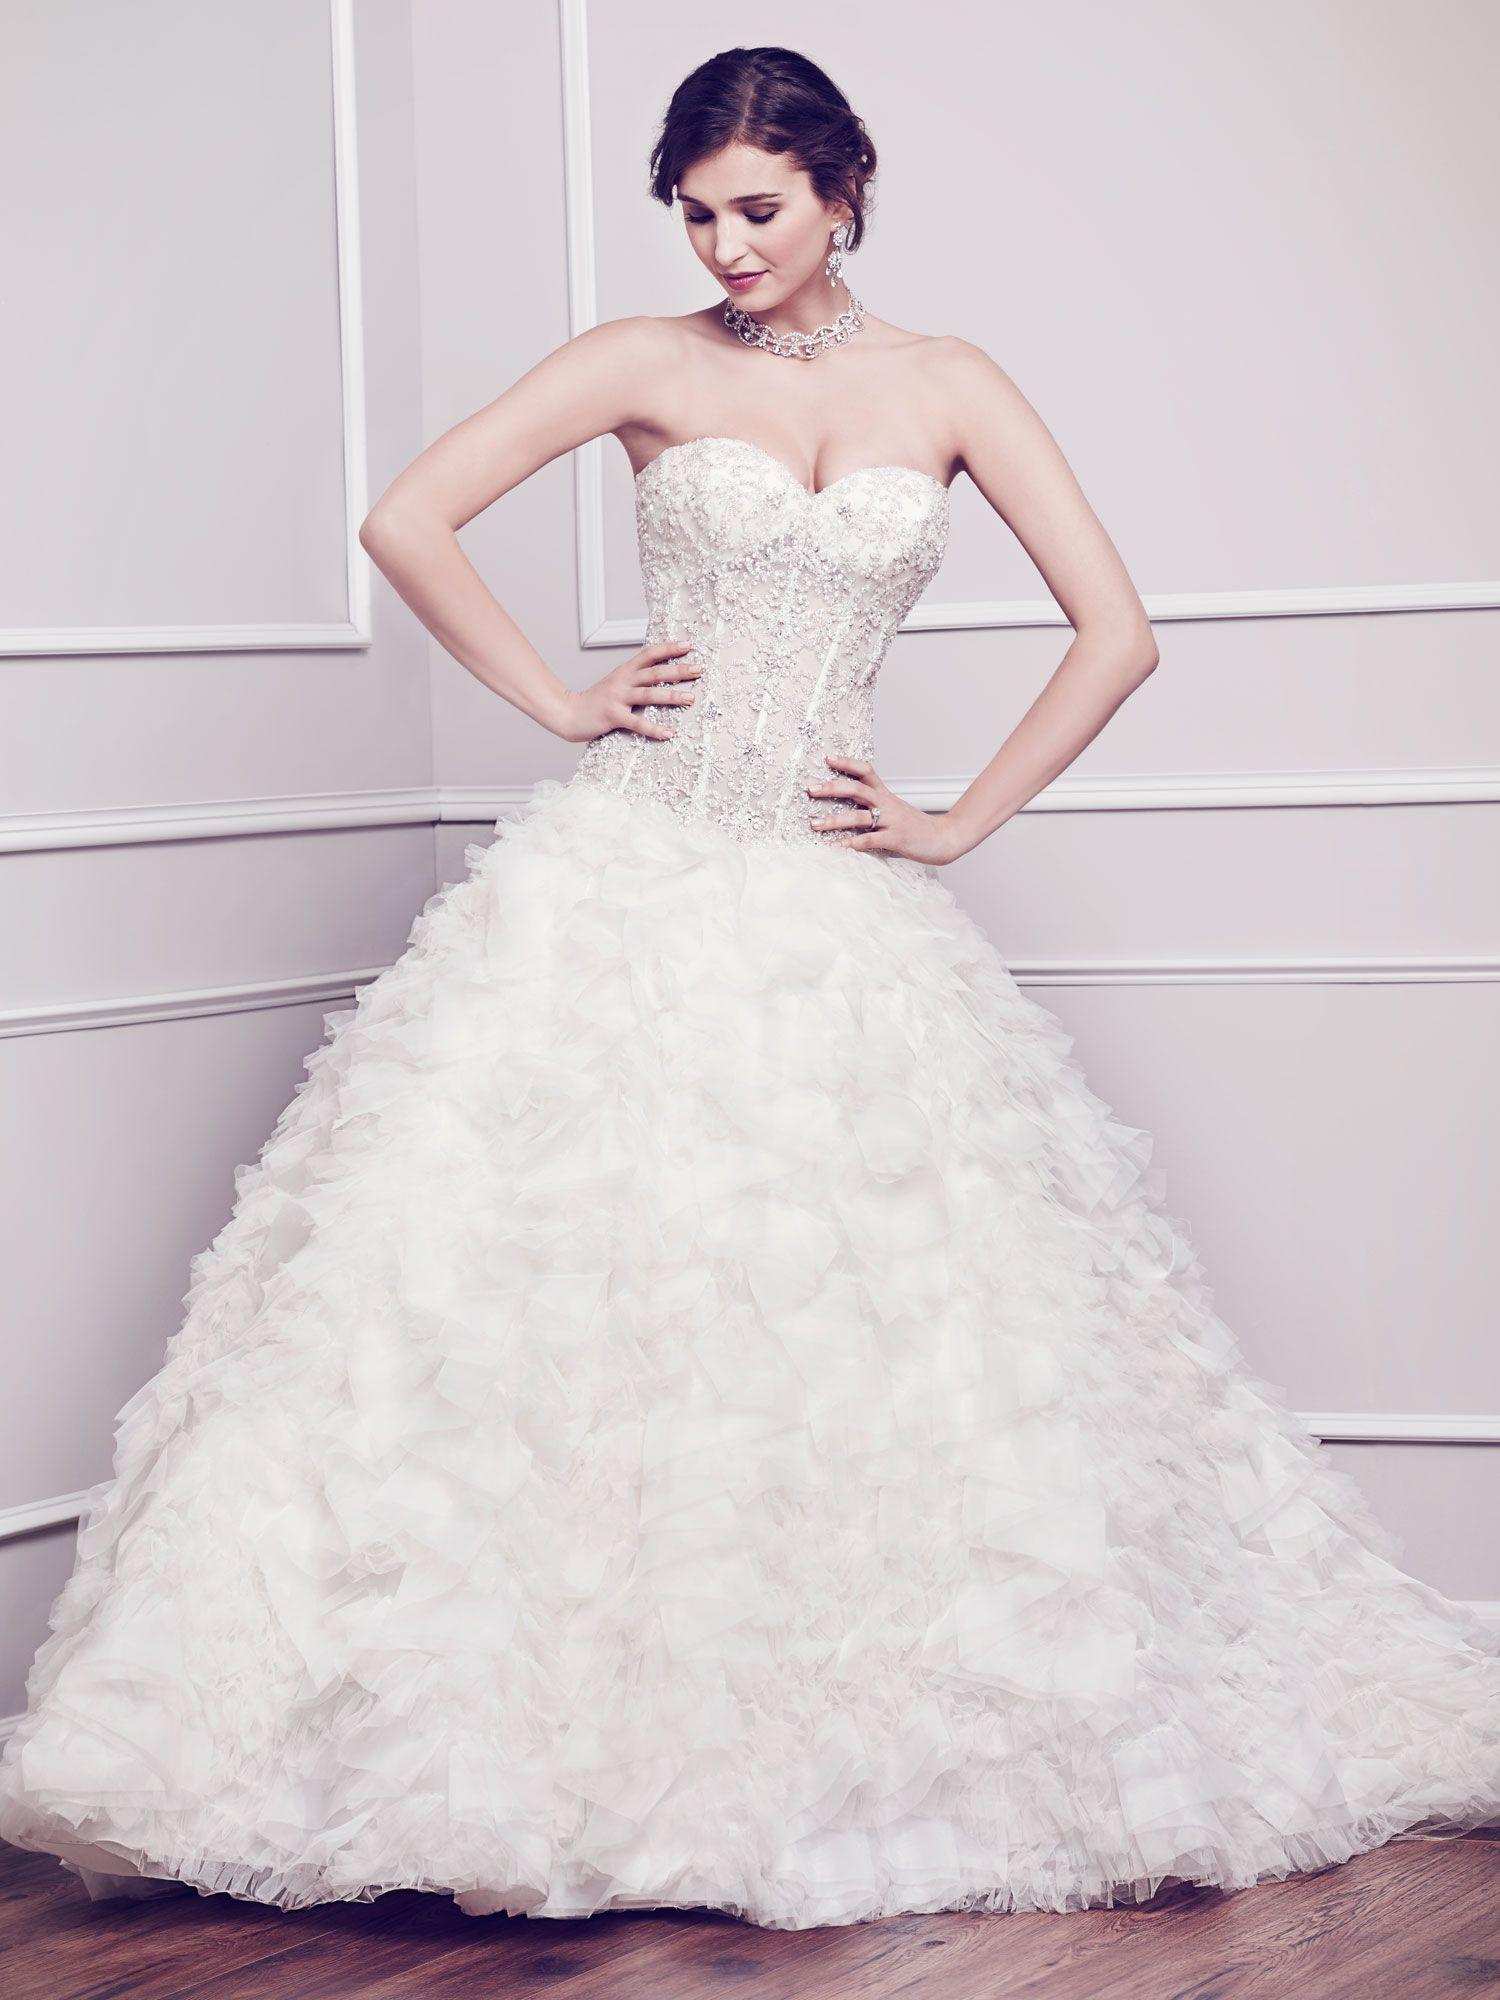 Winston Style 1574 Fairy tale wedding dress